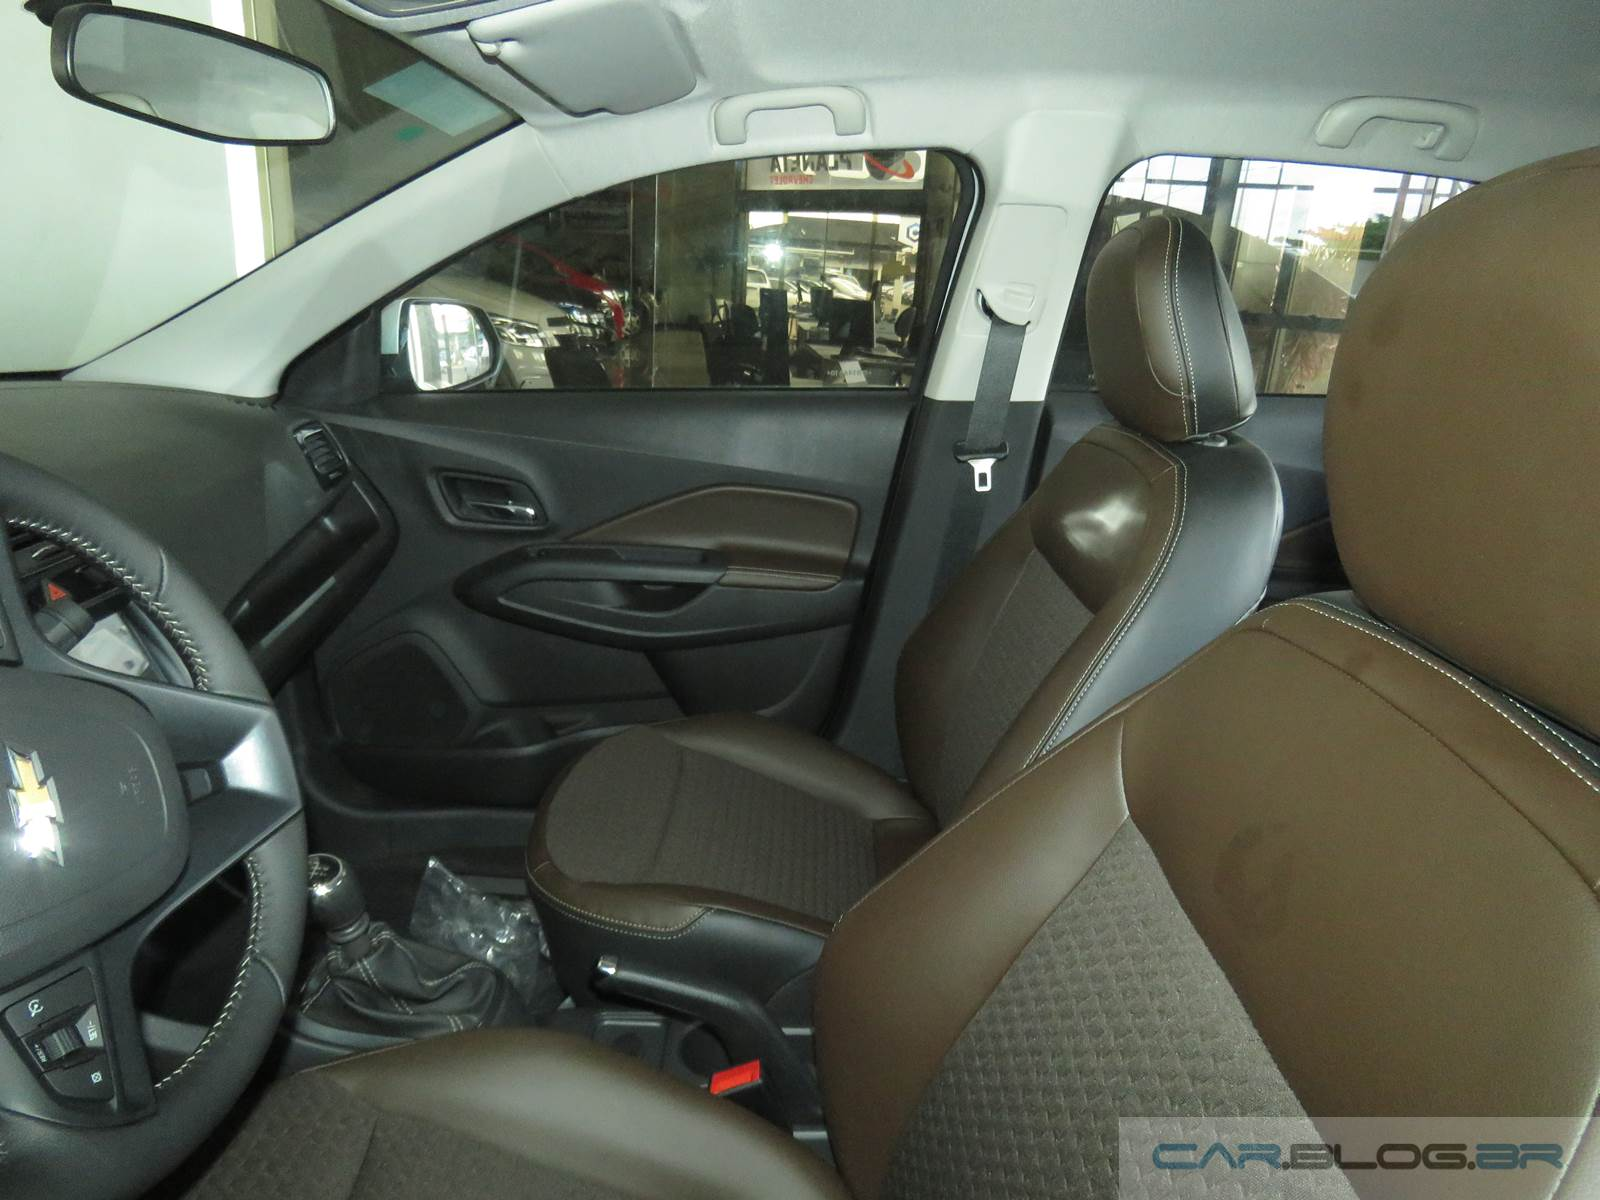 Chevrolet cobalt ltz 2016 interior